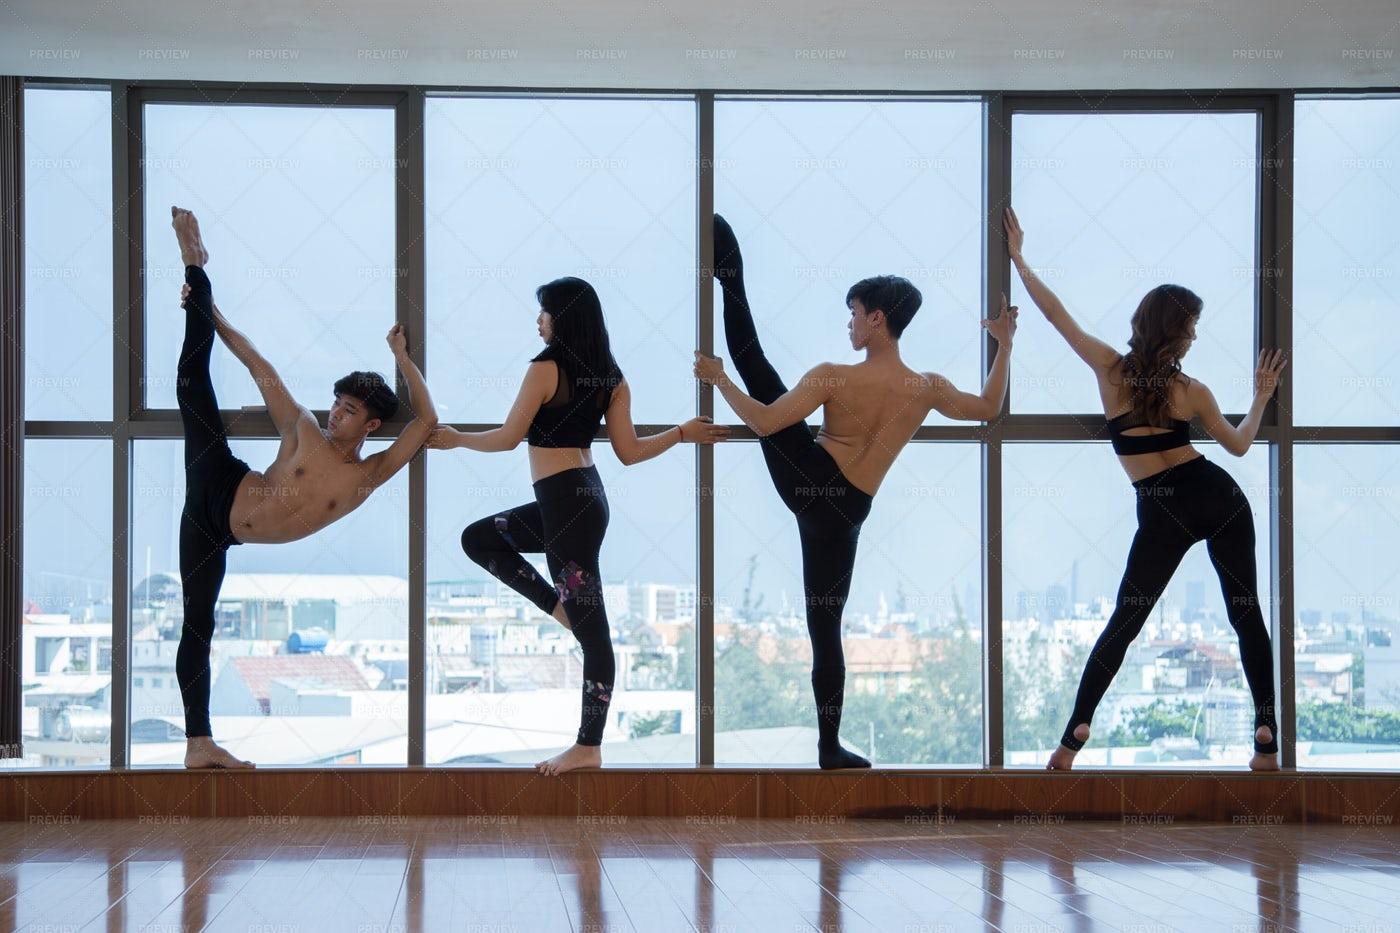 Dancers Stretching At Big Window: Stock Photos